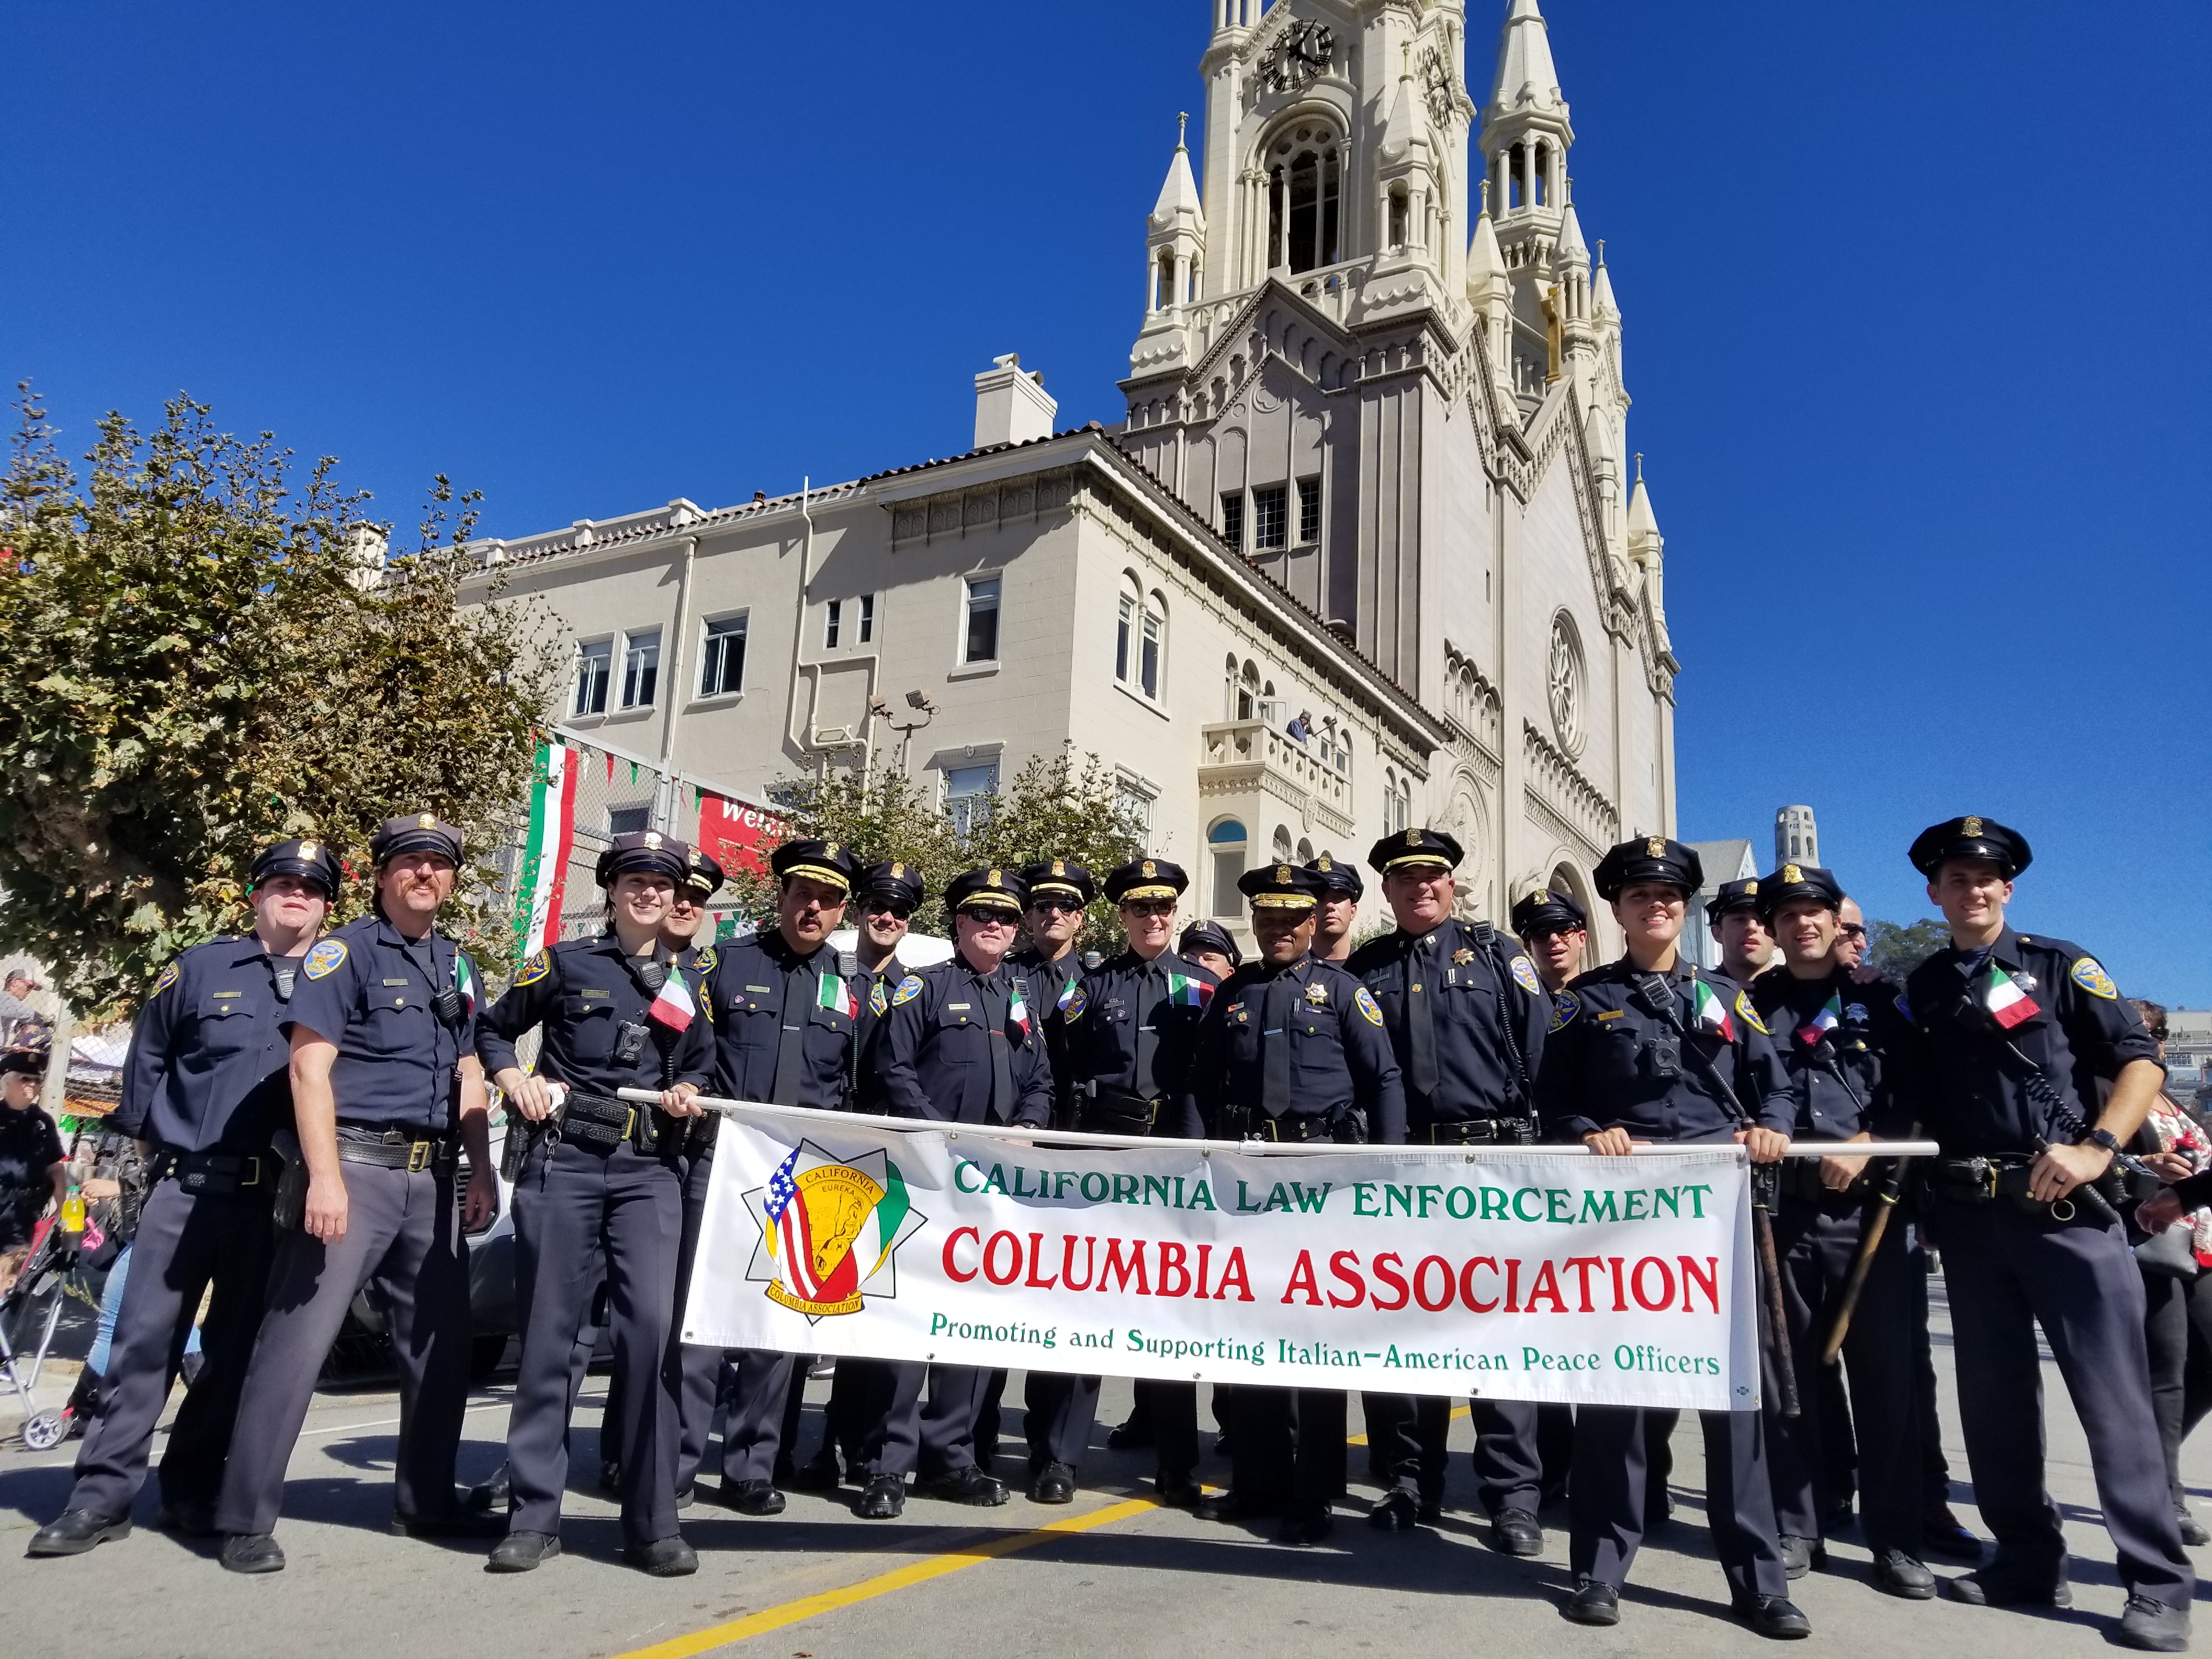 California Law Enforcement Columbia Association Promoting